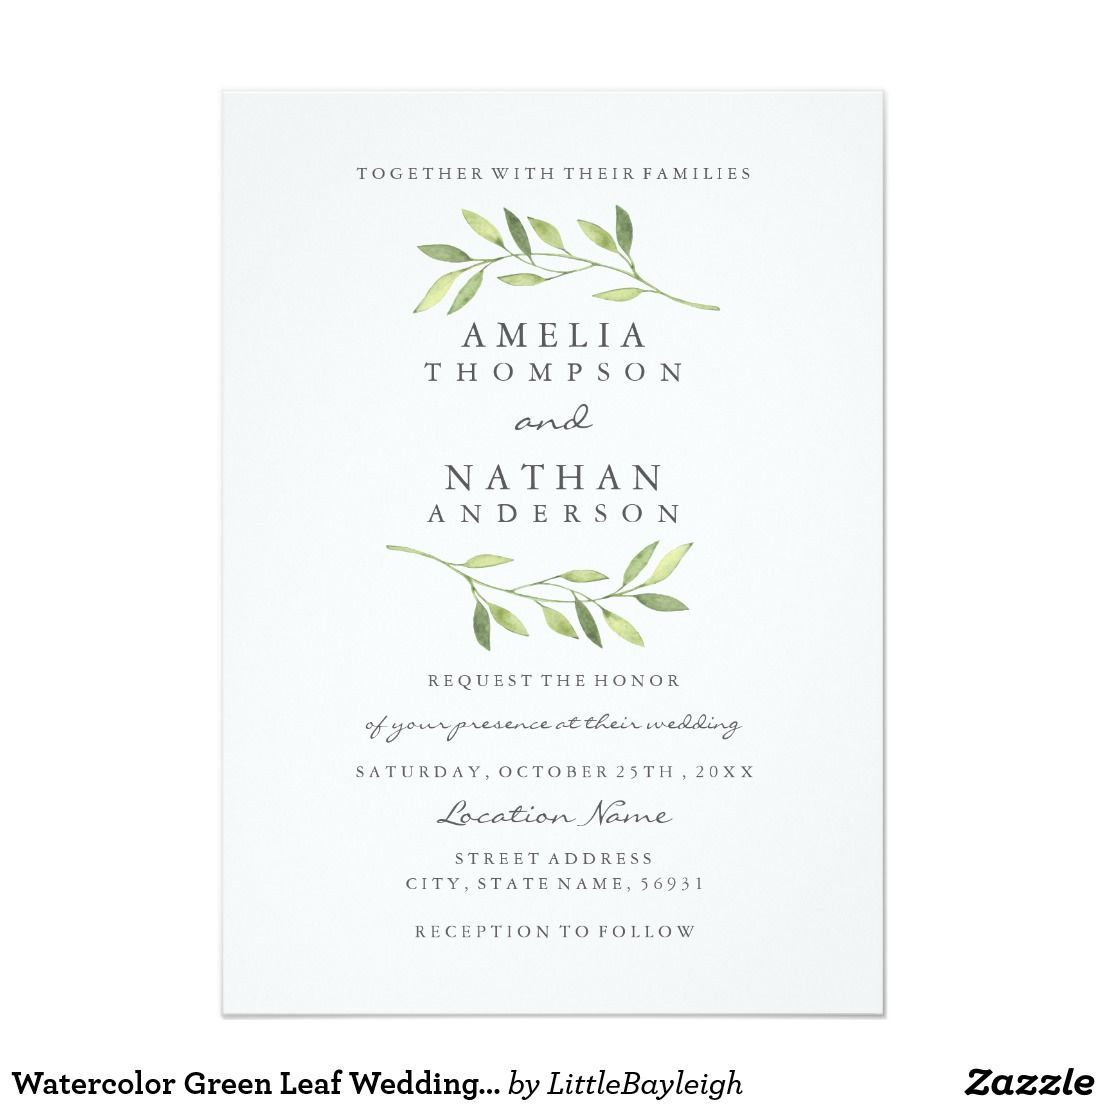 Watercolor Green Leaf Wedding Invitation | Pinterest | Weddings and ...